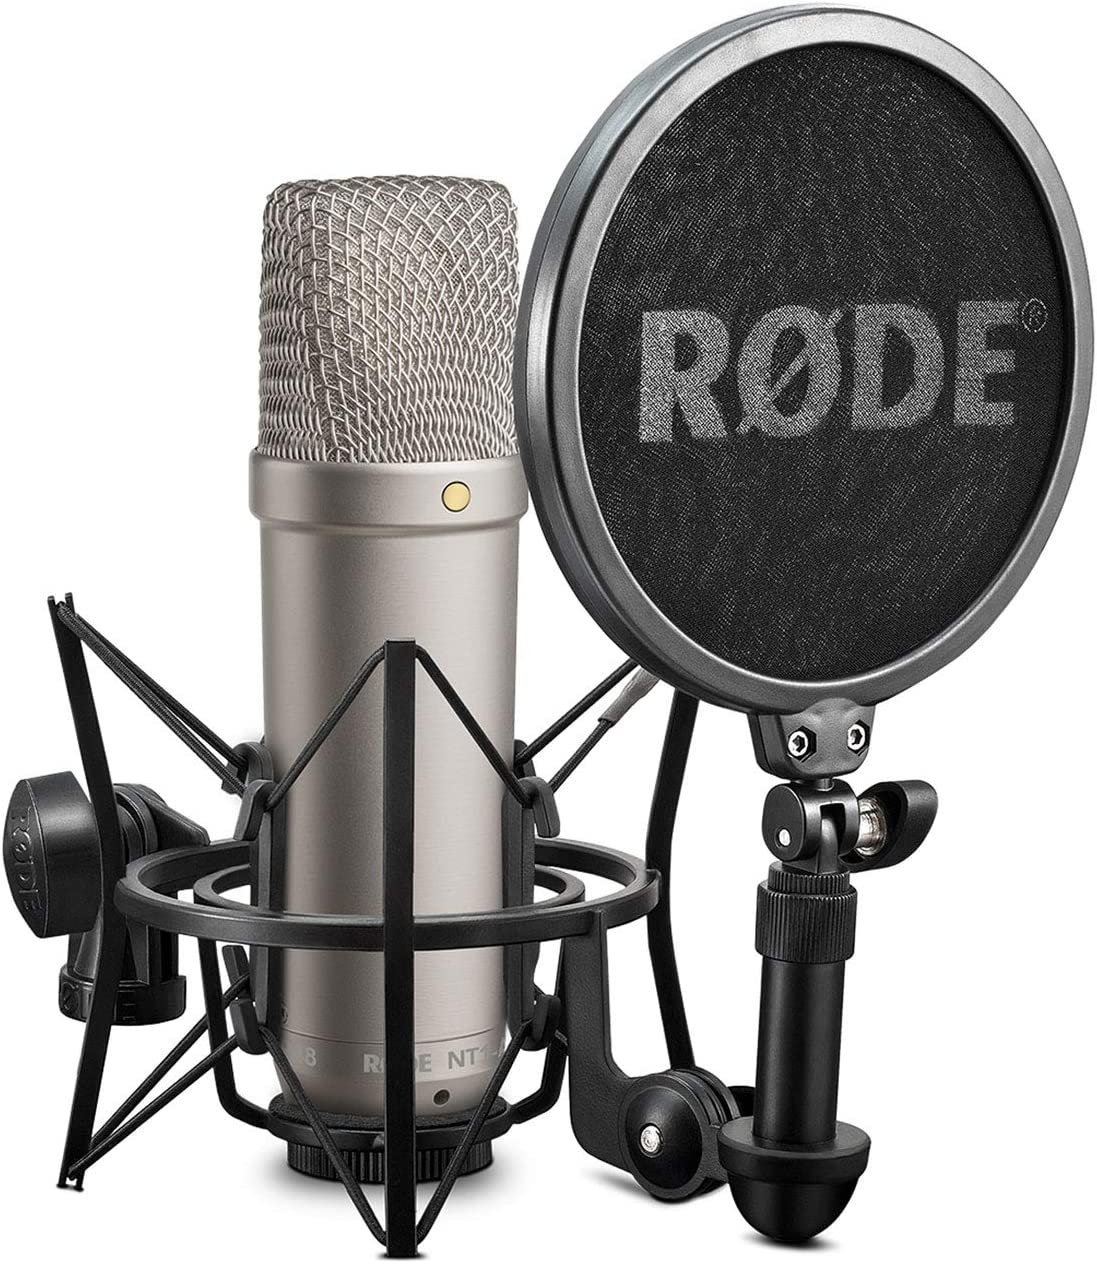 2 uscite 19 x 5 x 5cm /& Focusrite MOSC0024 Scarlett Solo 3rd Gen Interfaccia audio USB da 2 ingressi Rode Microphones NT1A Microfono a diaframma largo per studi di registrazione//podcast